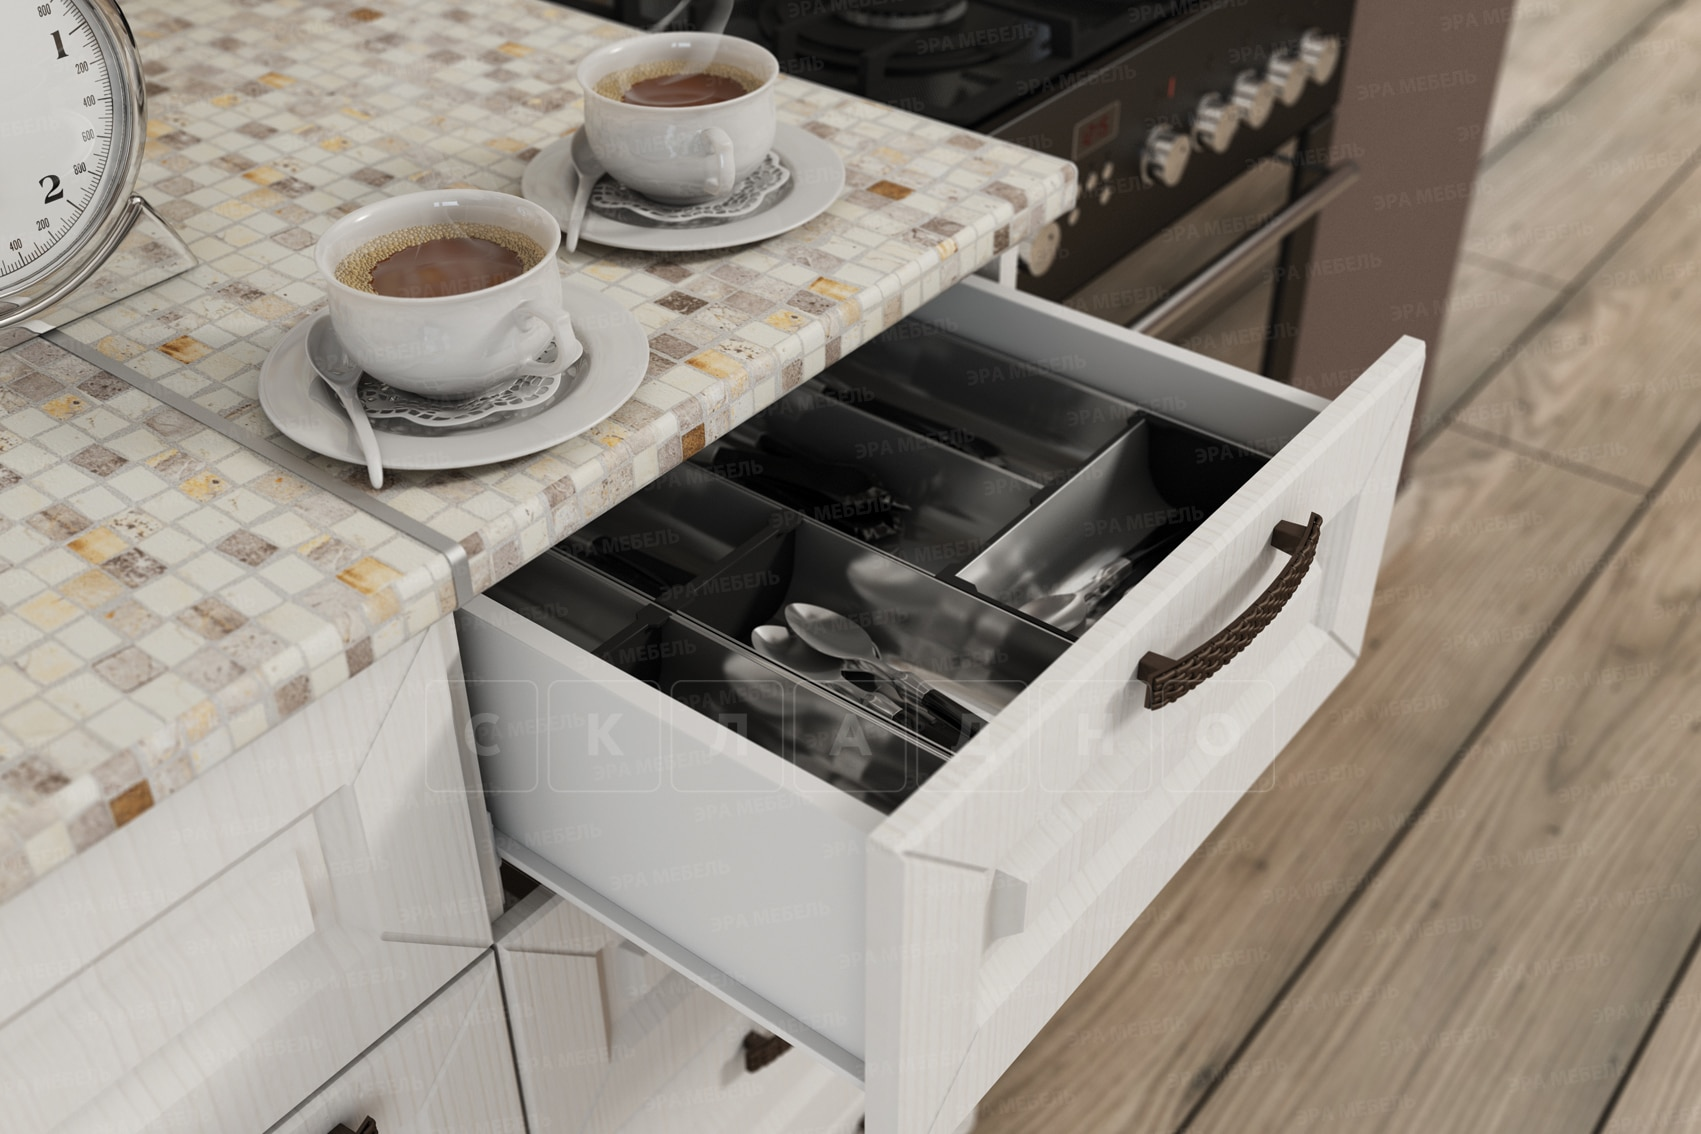 Кухонный гарнитур с пеналом Агава 3,0м вариант 2 фото 5 | интернет-магазин Складно